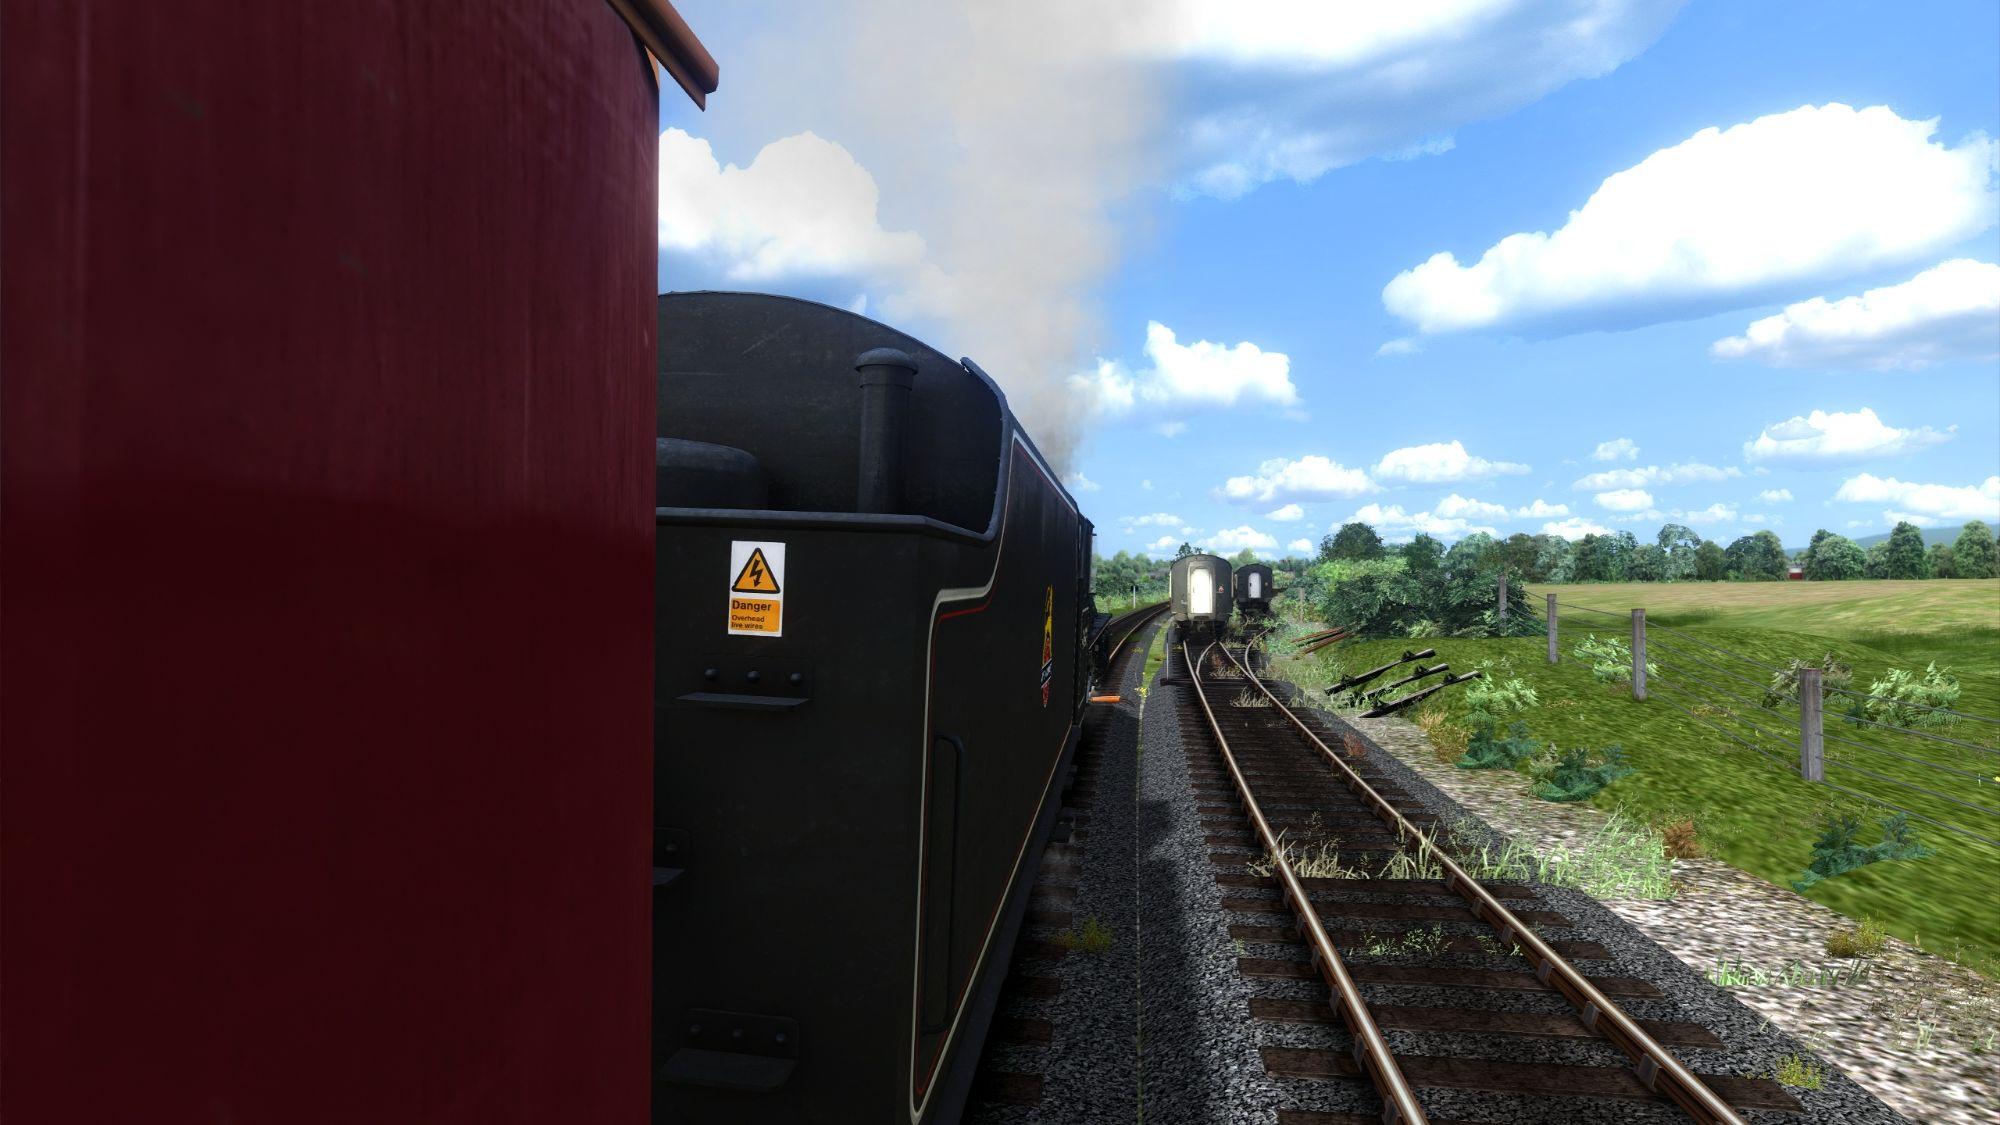 Screenshot_West Somerset Members Edition V4JLW_51.04948--3.19061_12-21-36